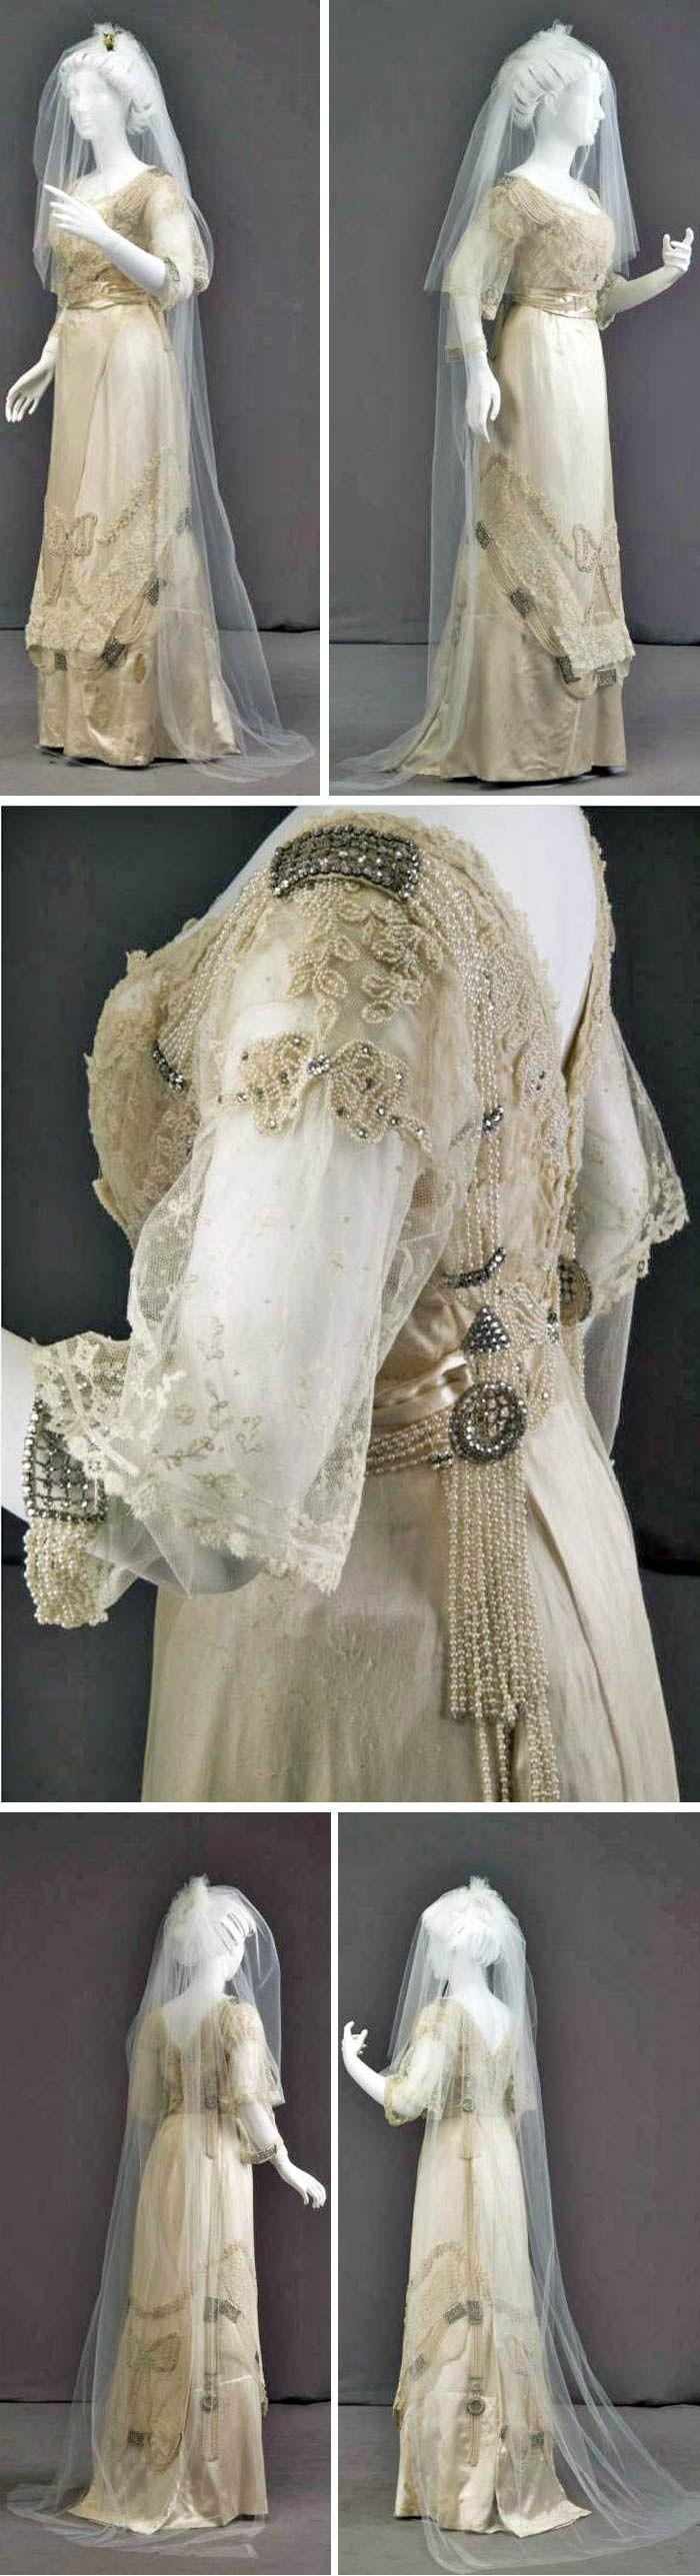 Wedding dress, New Zealand, 1890s. Silk satin